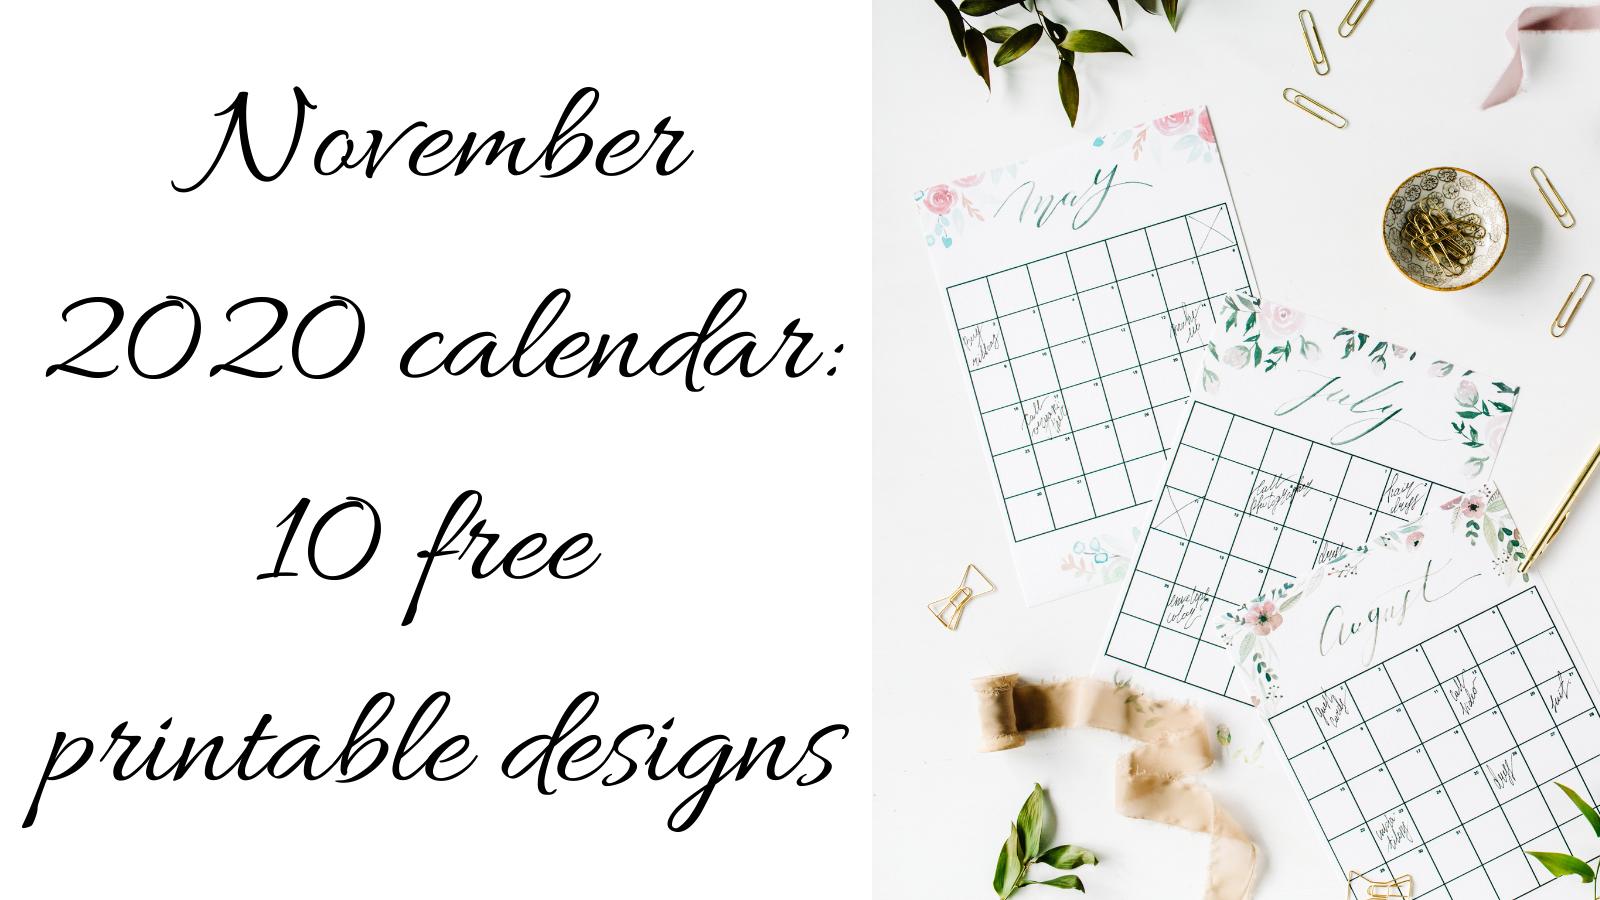 10 free printable november 2020 calendars!